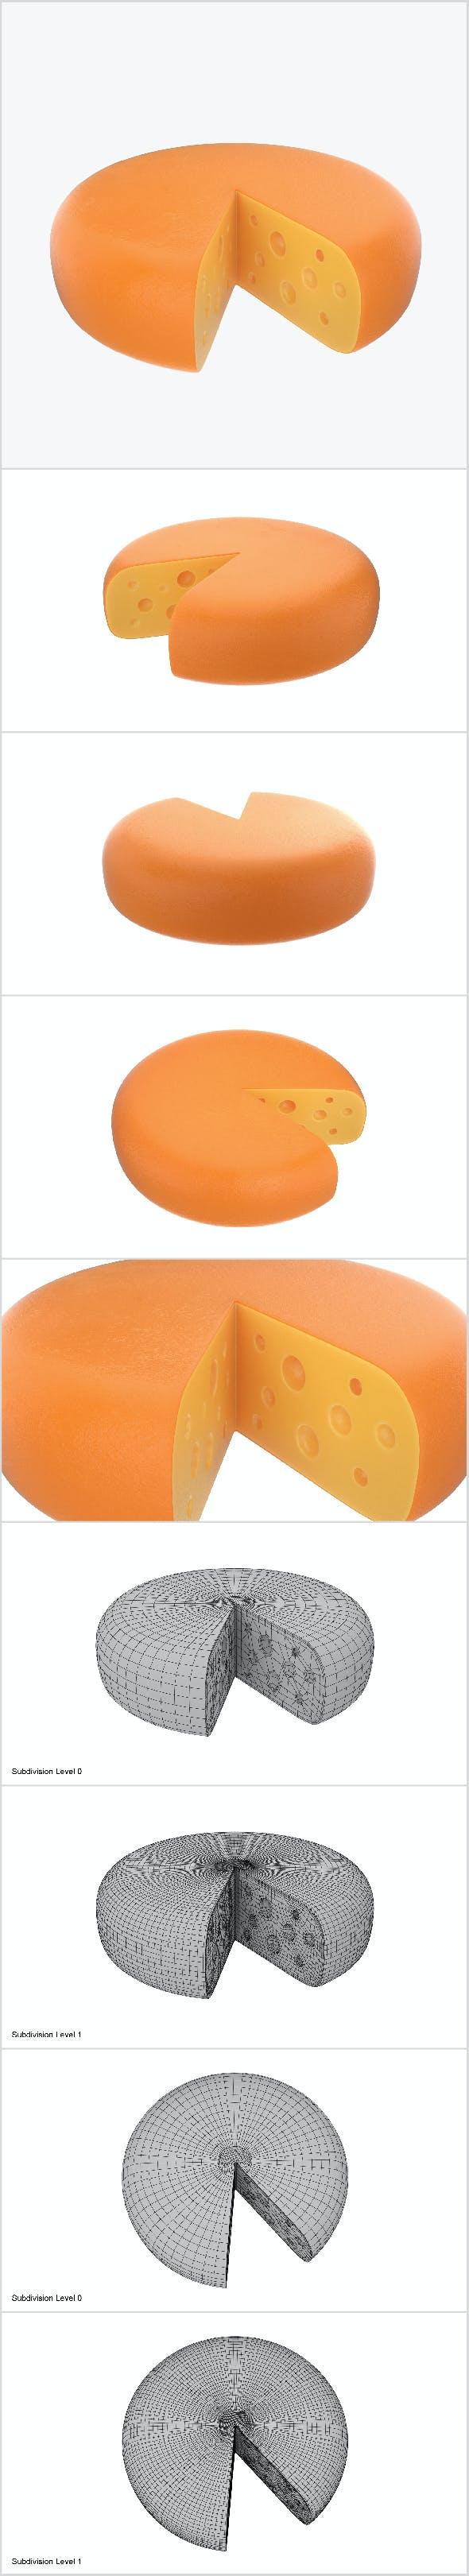 Cheese wheel sliced - 3DOcean Item for Sale